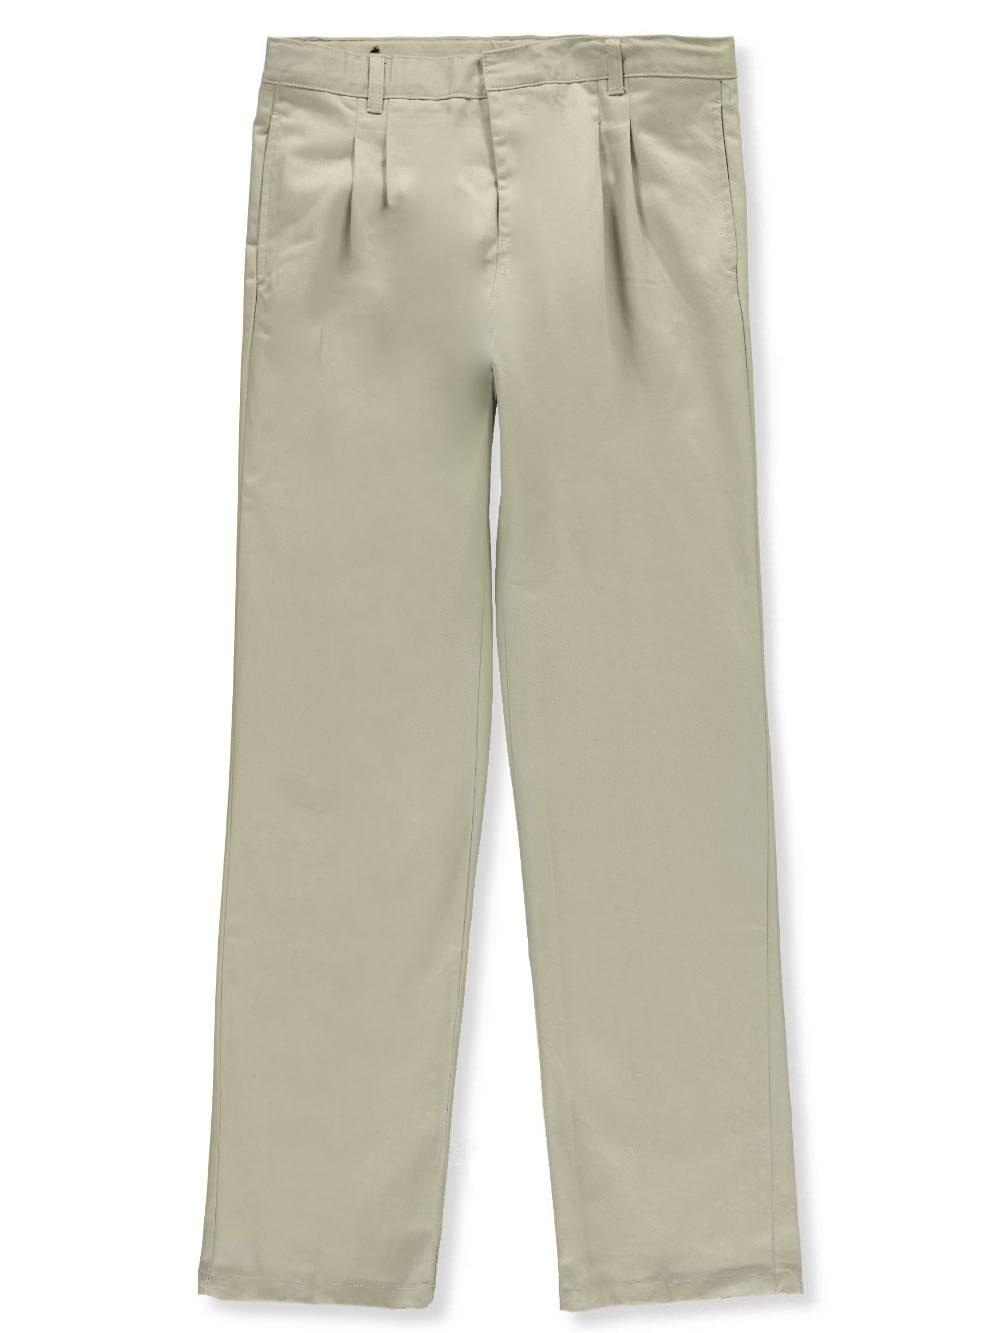 16 Khaki French Toast Big Boys Pleated Wrinkle No More Double Knee Pants